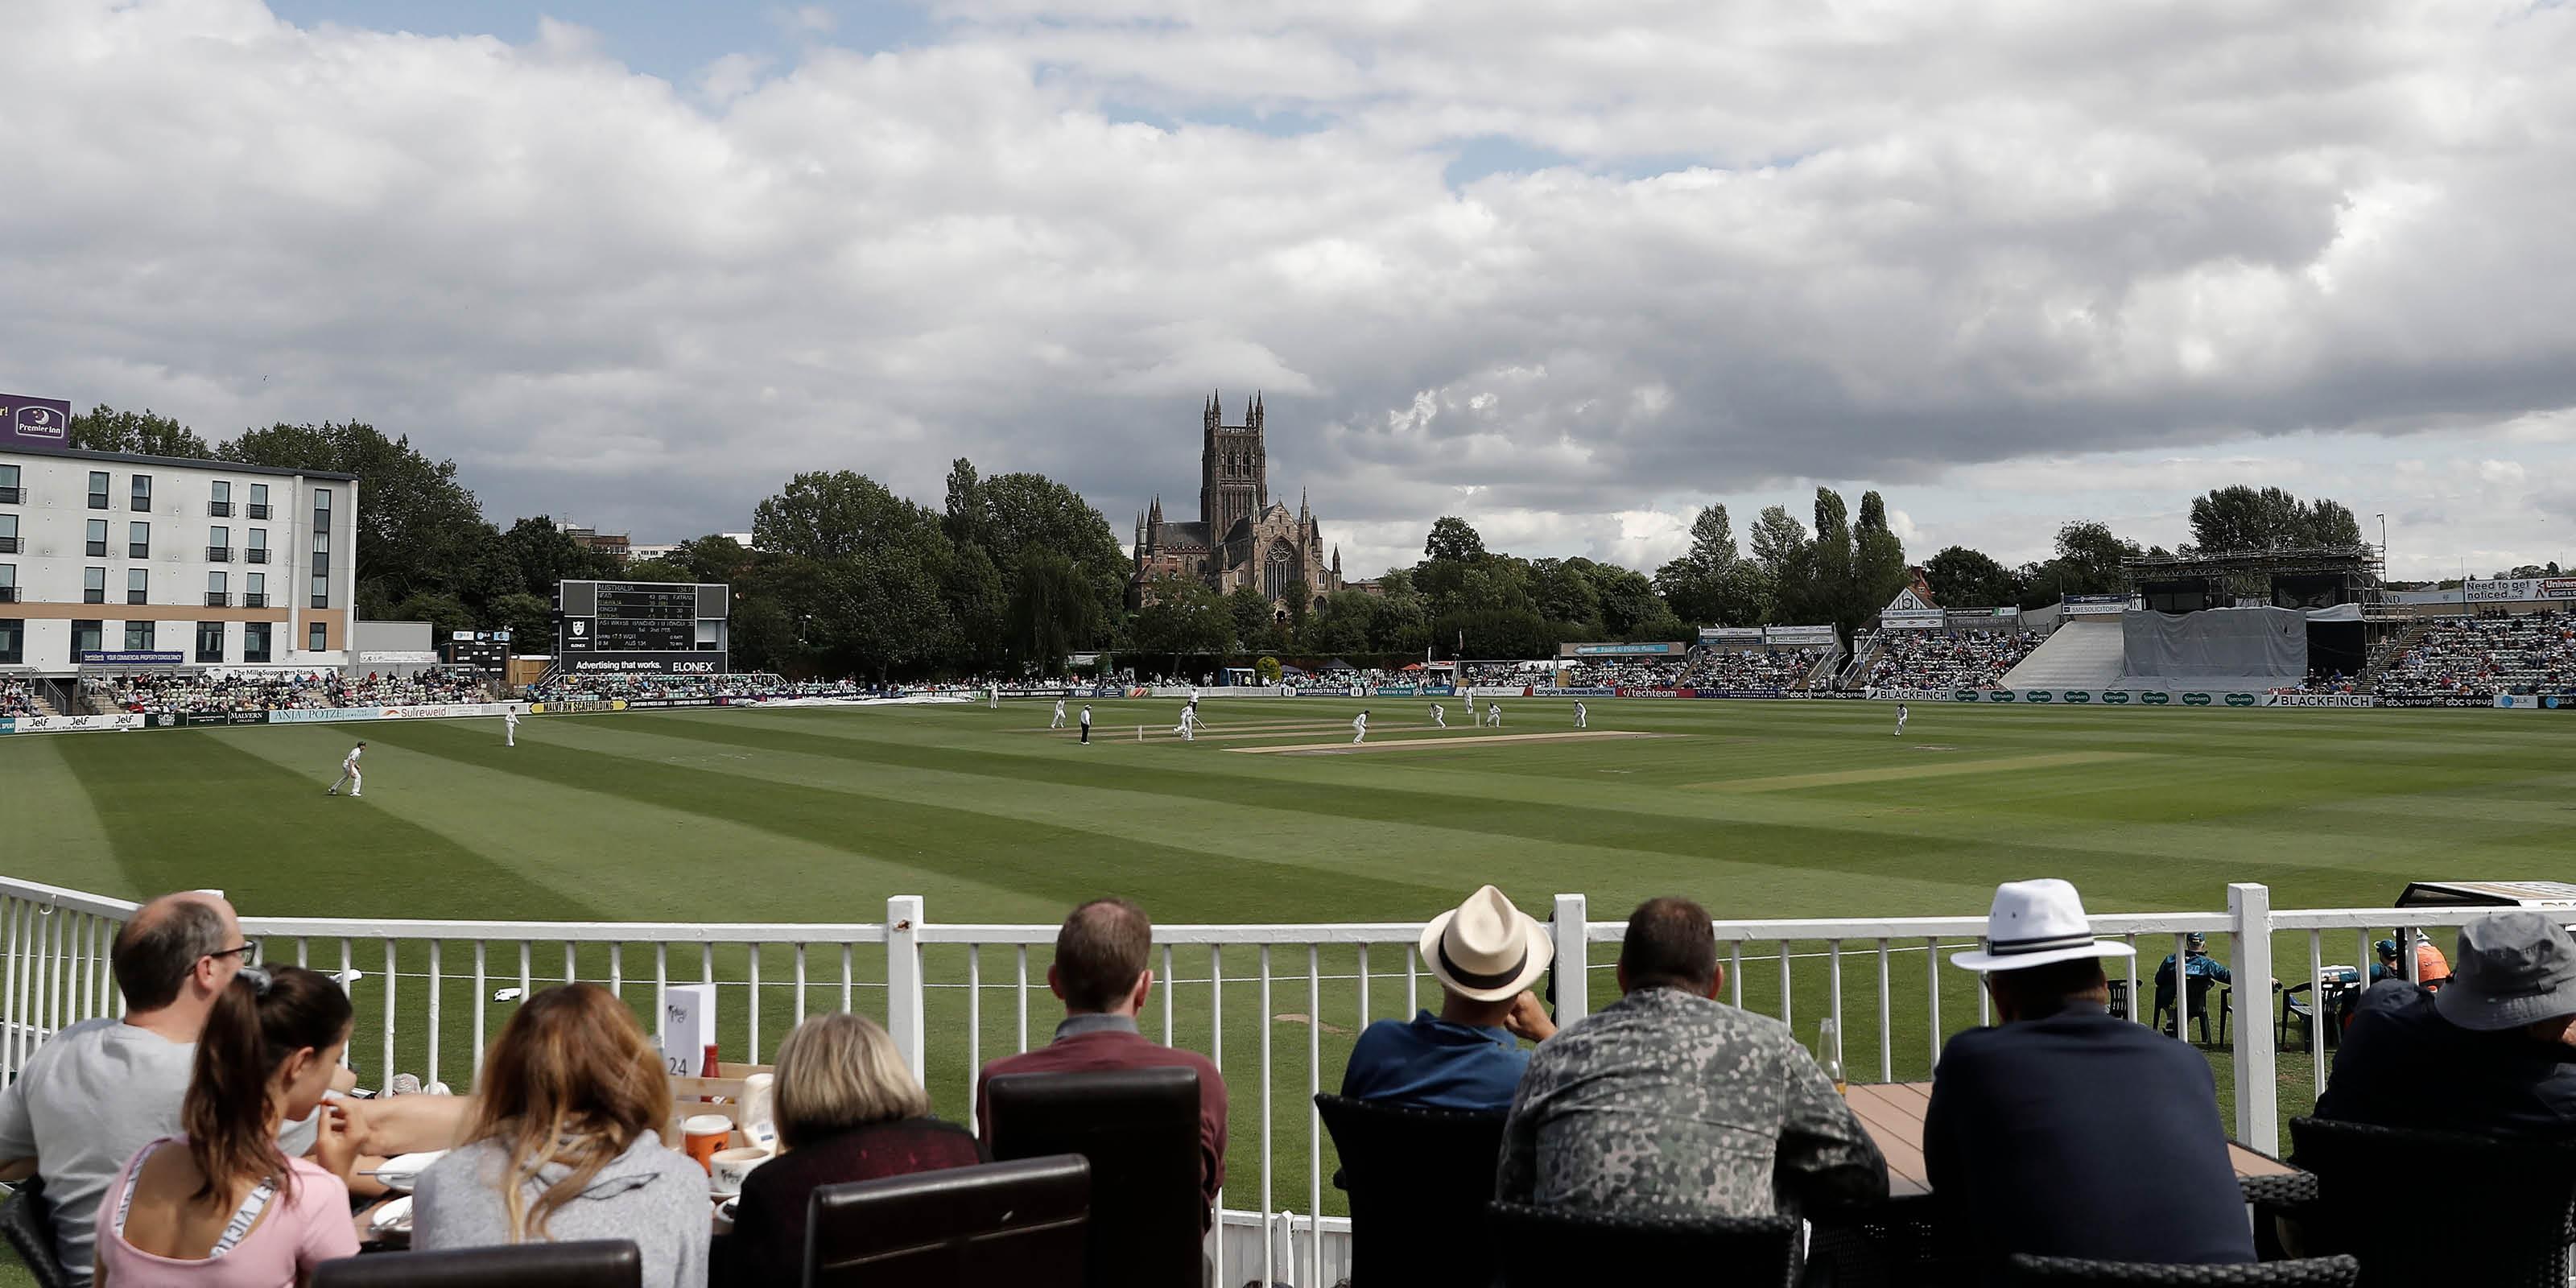 Worcestershire County Cricket Club Linkedin